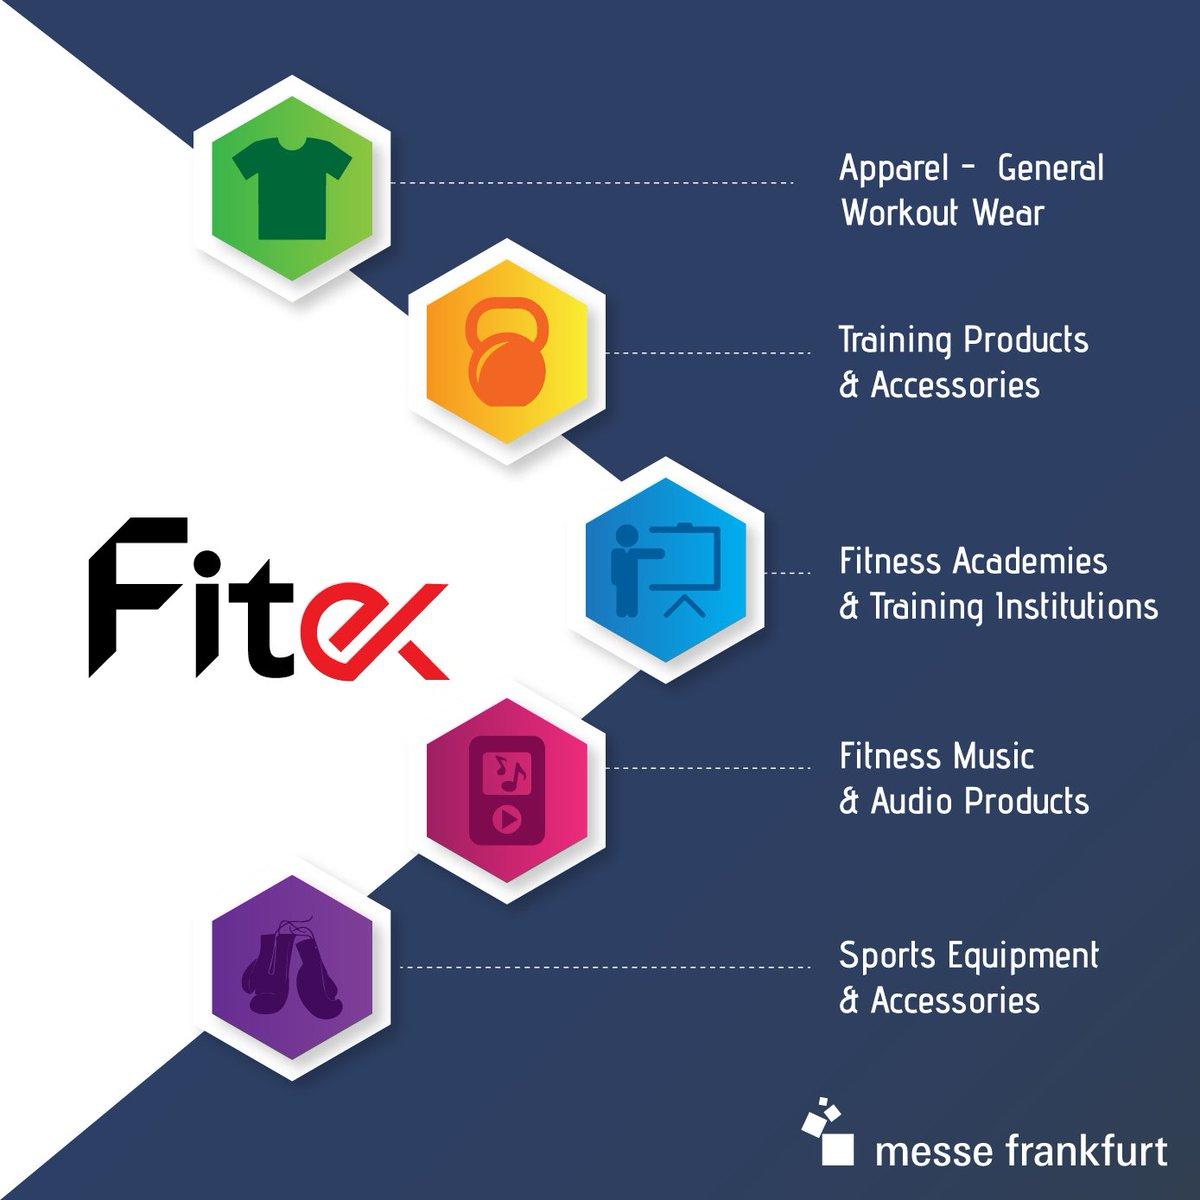 fitex2019 hashtag on Twitter